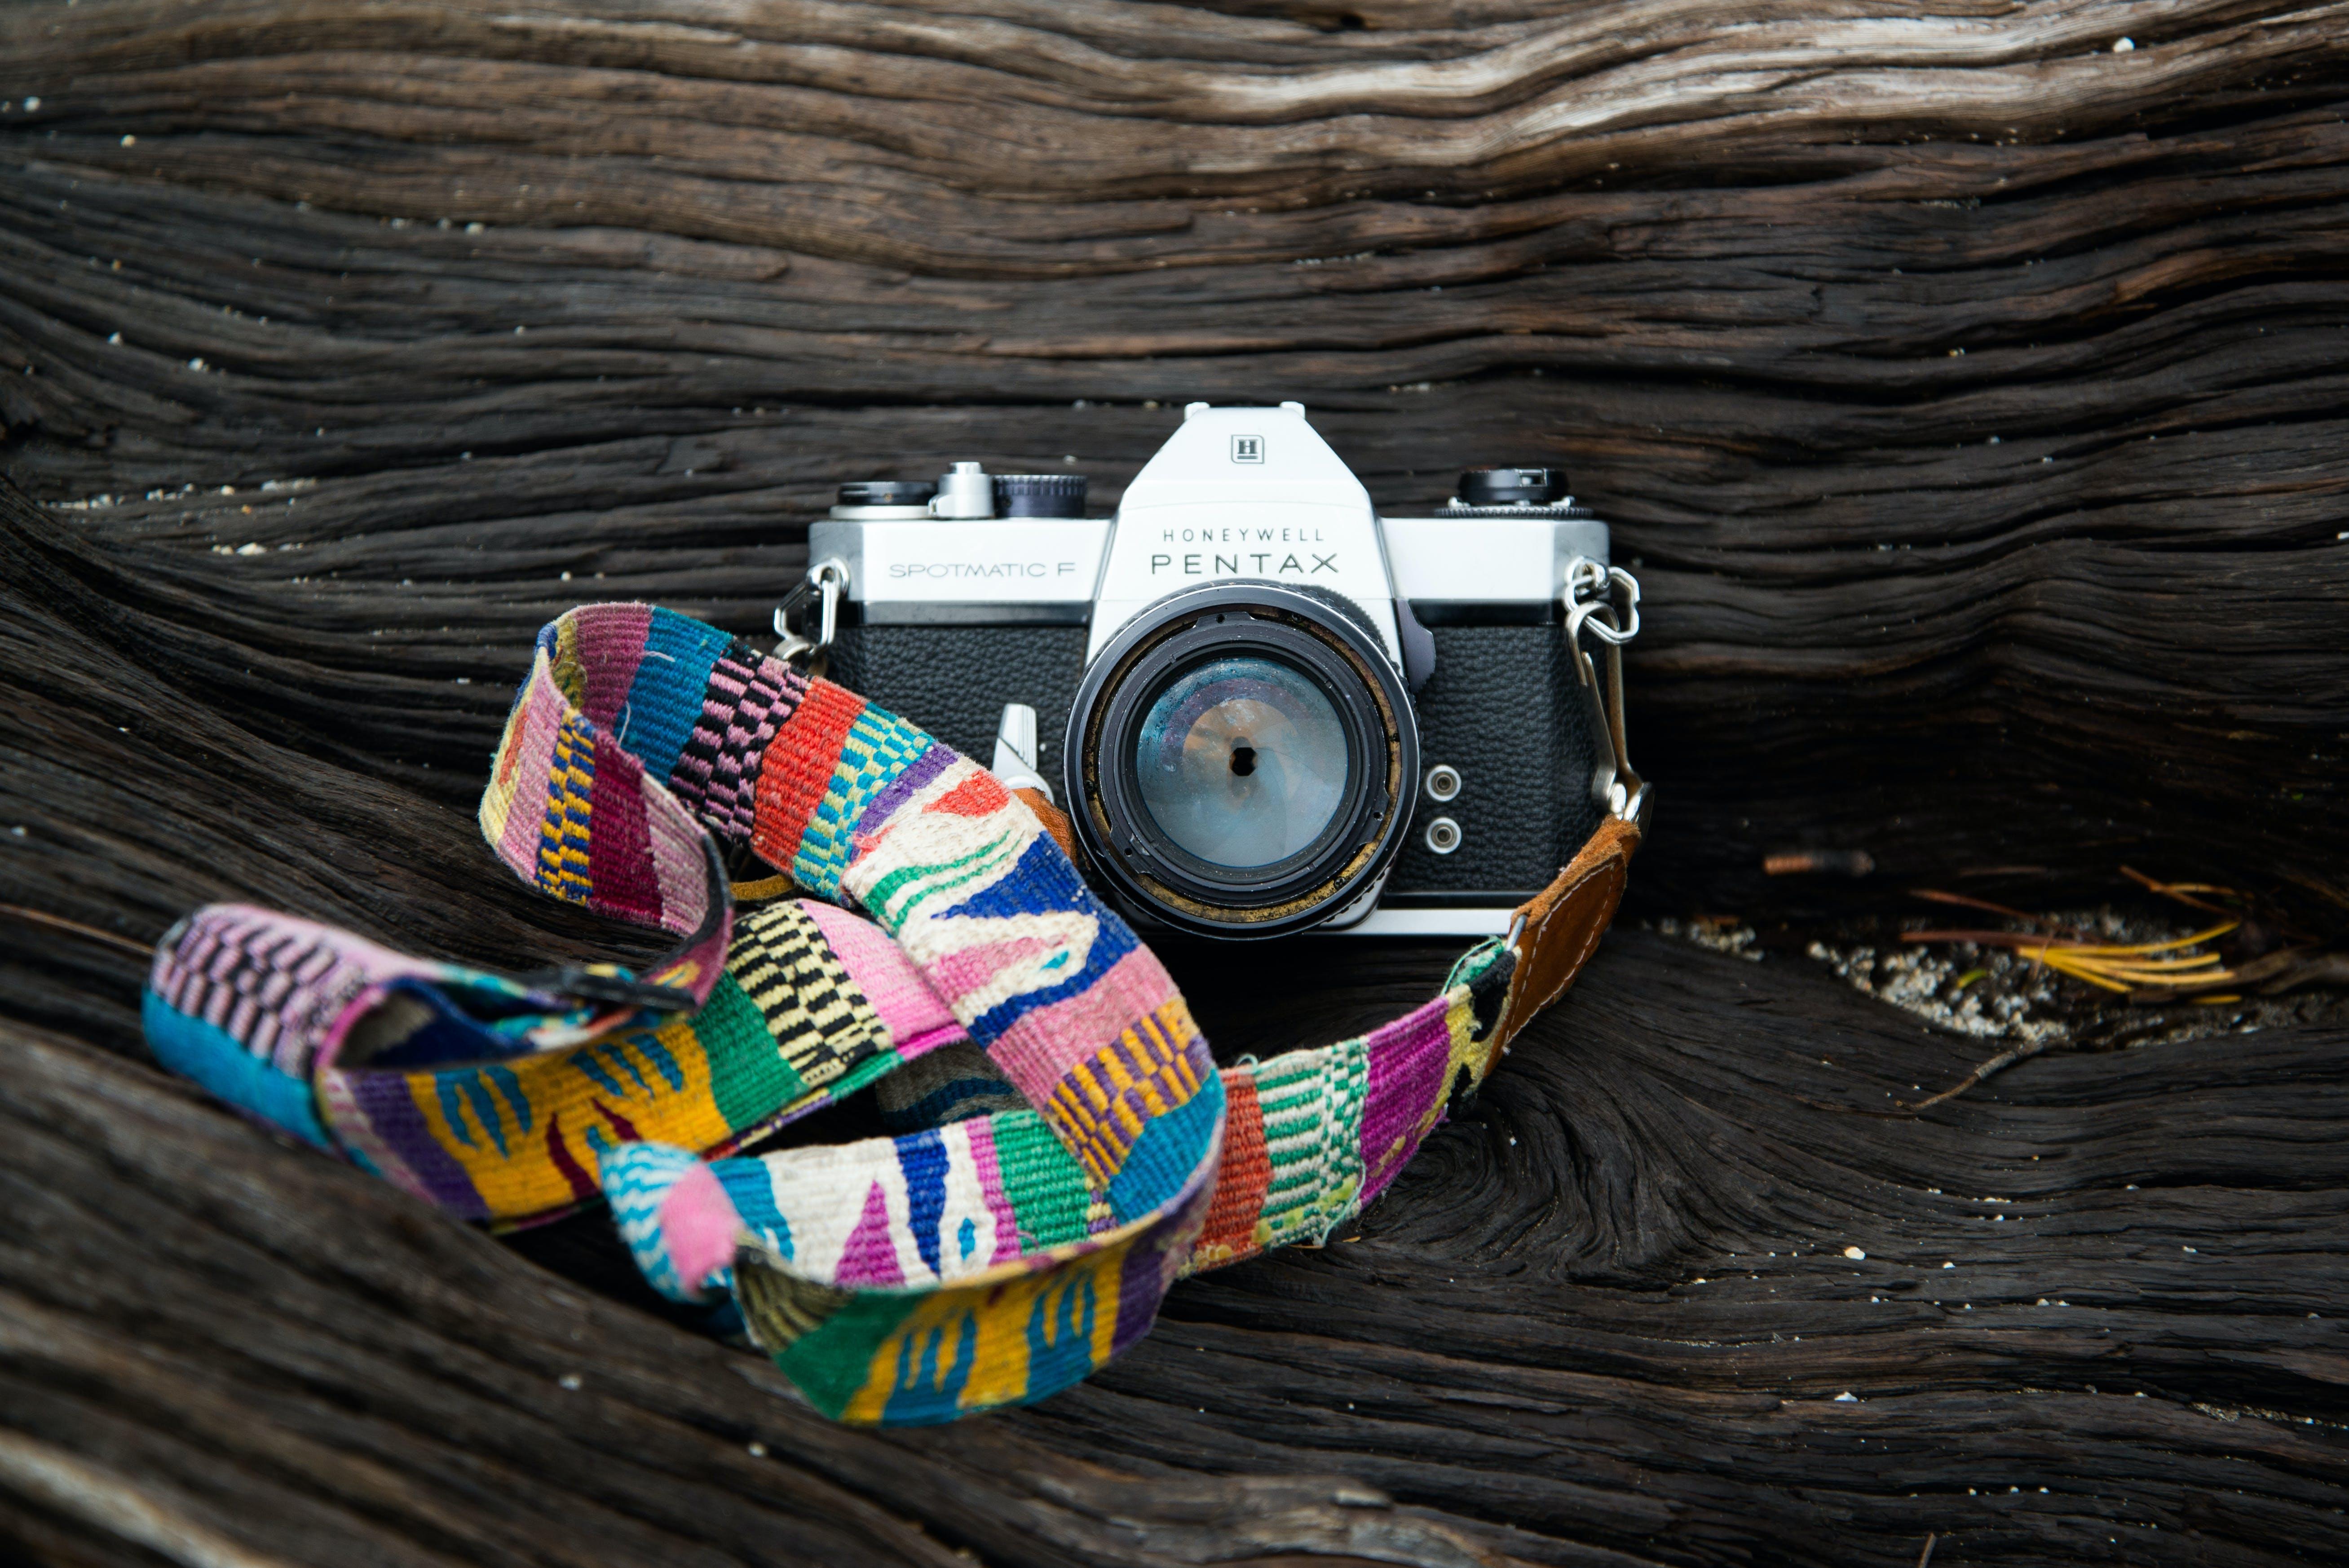 Gratis stockfoto met camera, designen, donker, fotografie